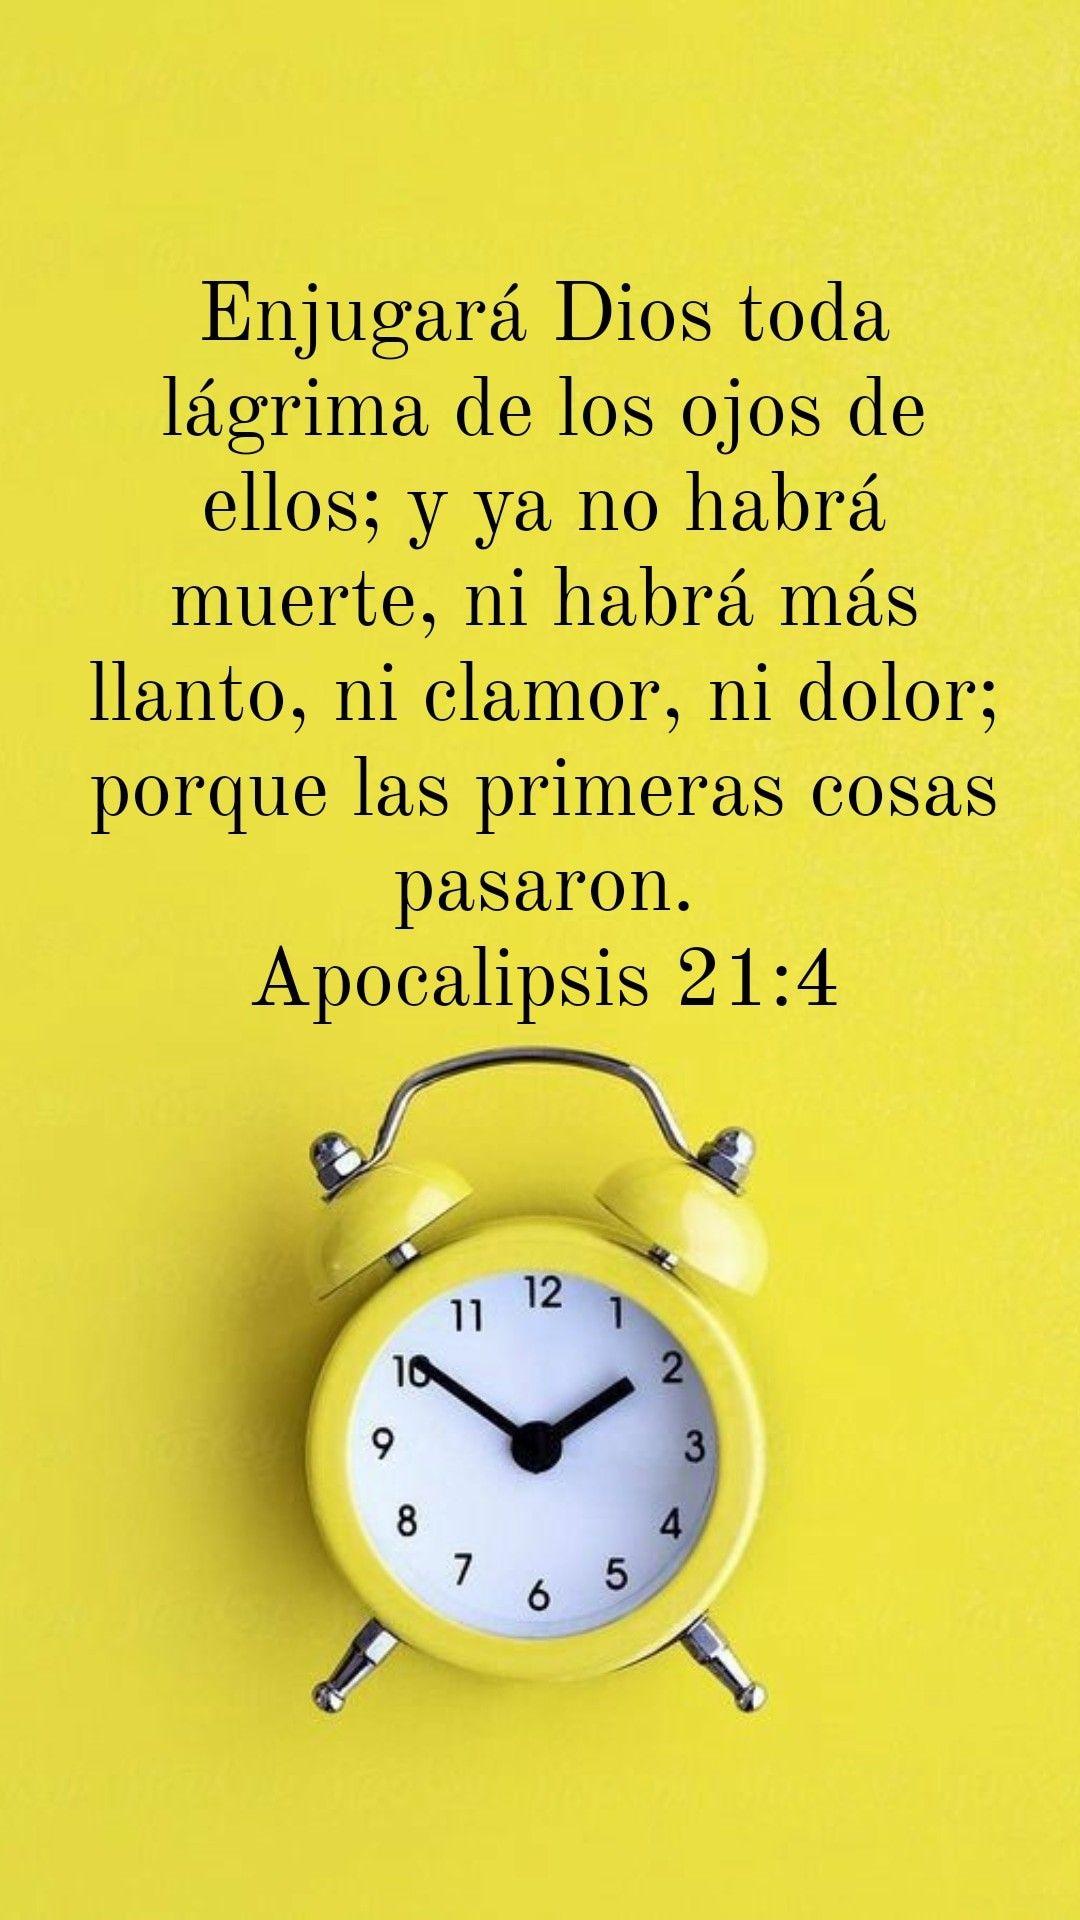 Apocalipsis 21 4 Frases Biblicas De Animo Reflexiones De Dios Palabra De Dios Biblia